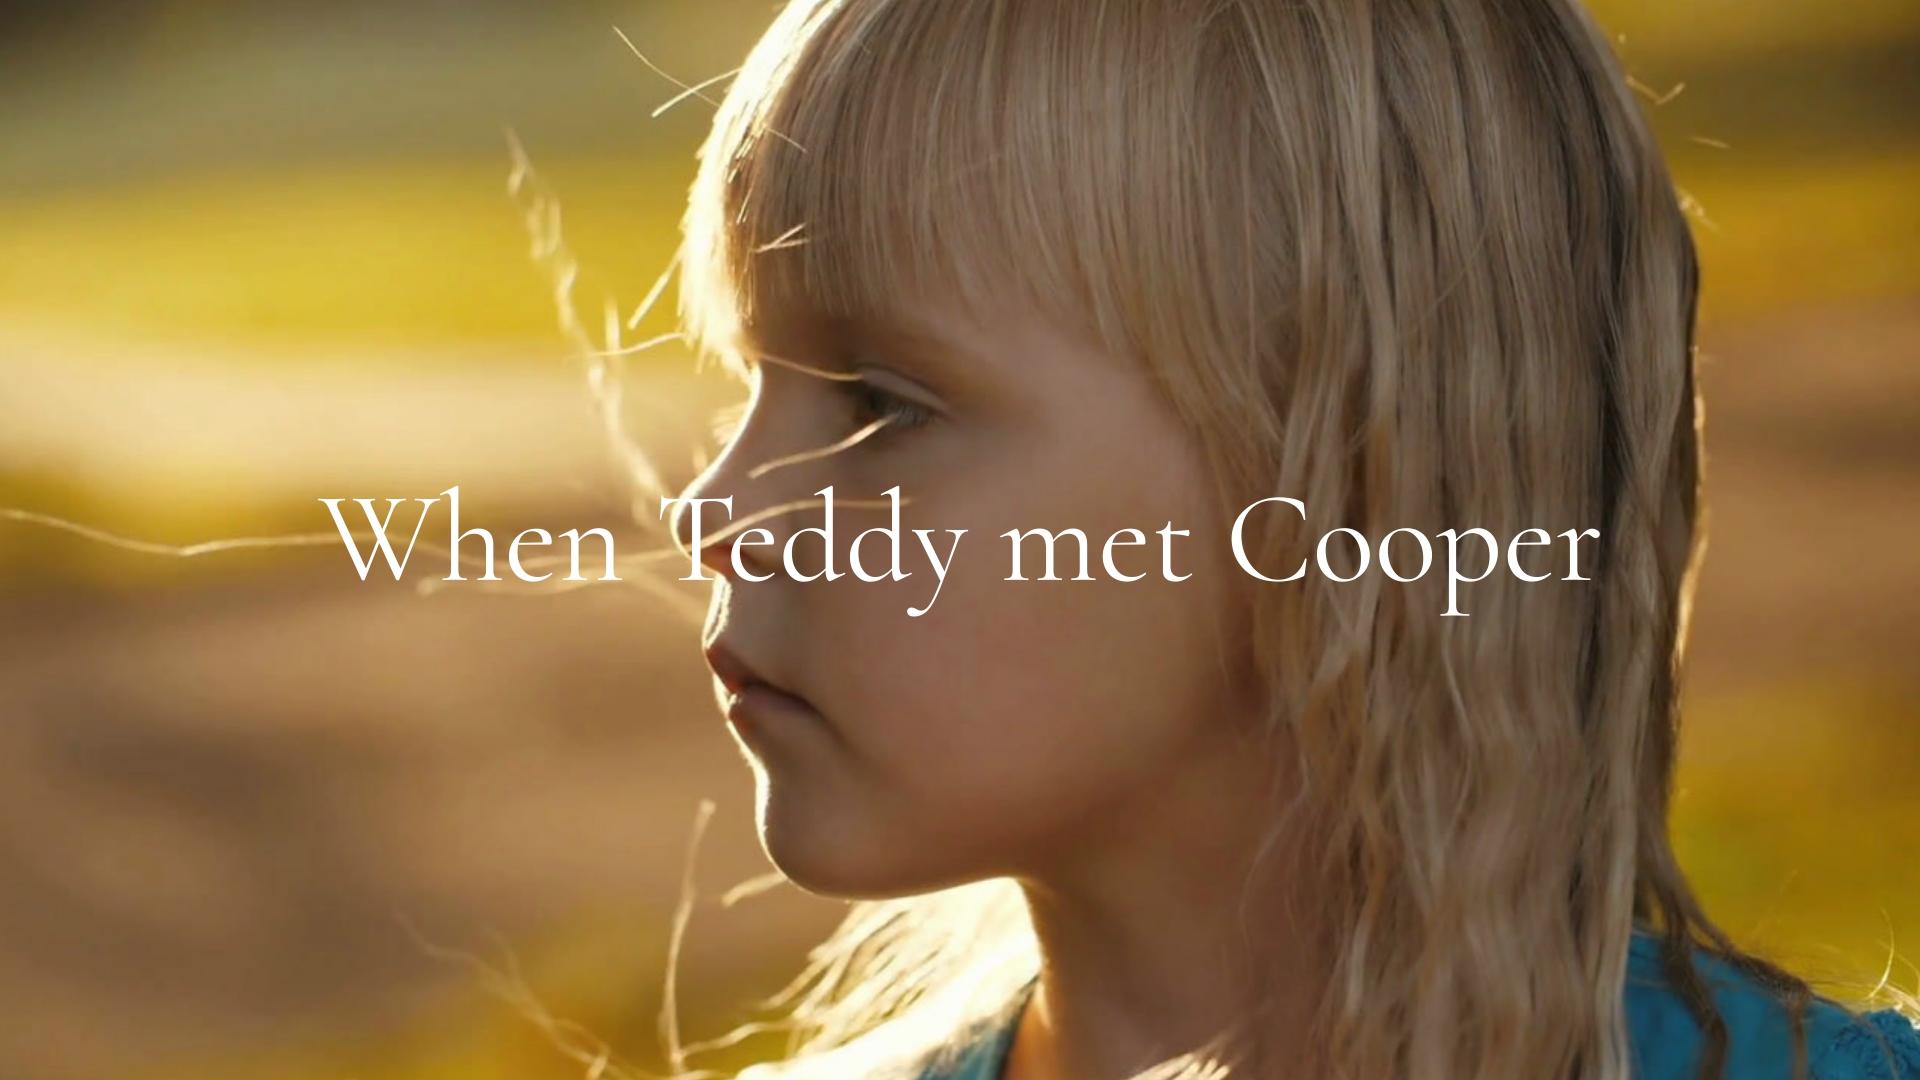 Kids Movie - Trailer Video Template